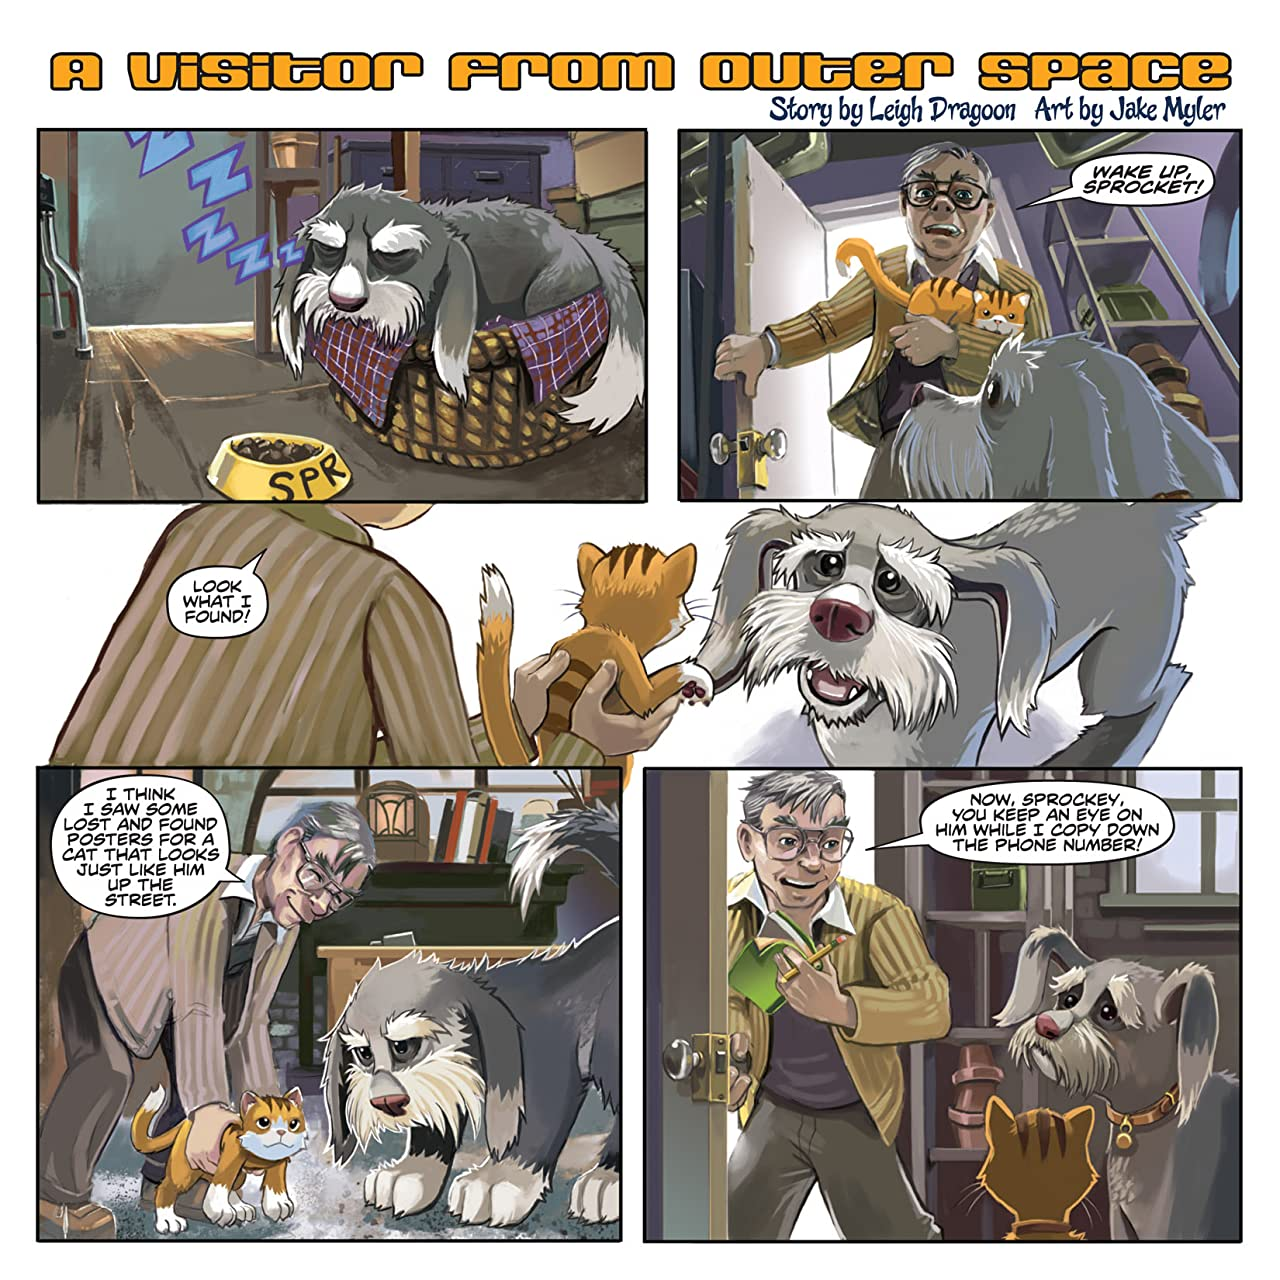 Jim Henson's Fraggle Rock Vol. 1 #2 (of 3)